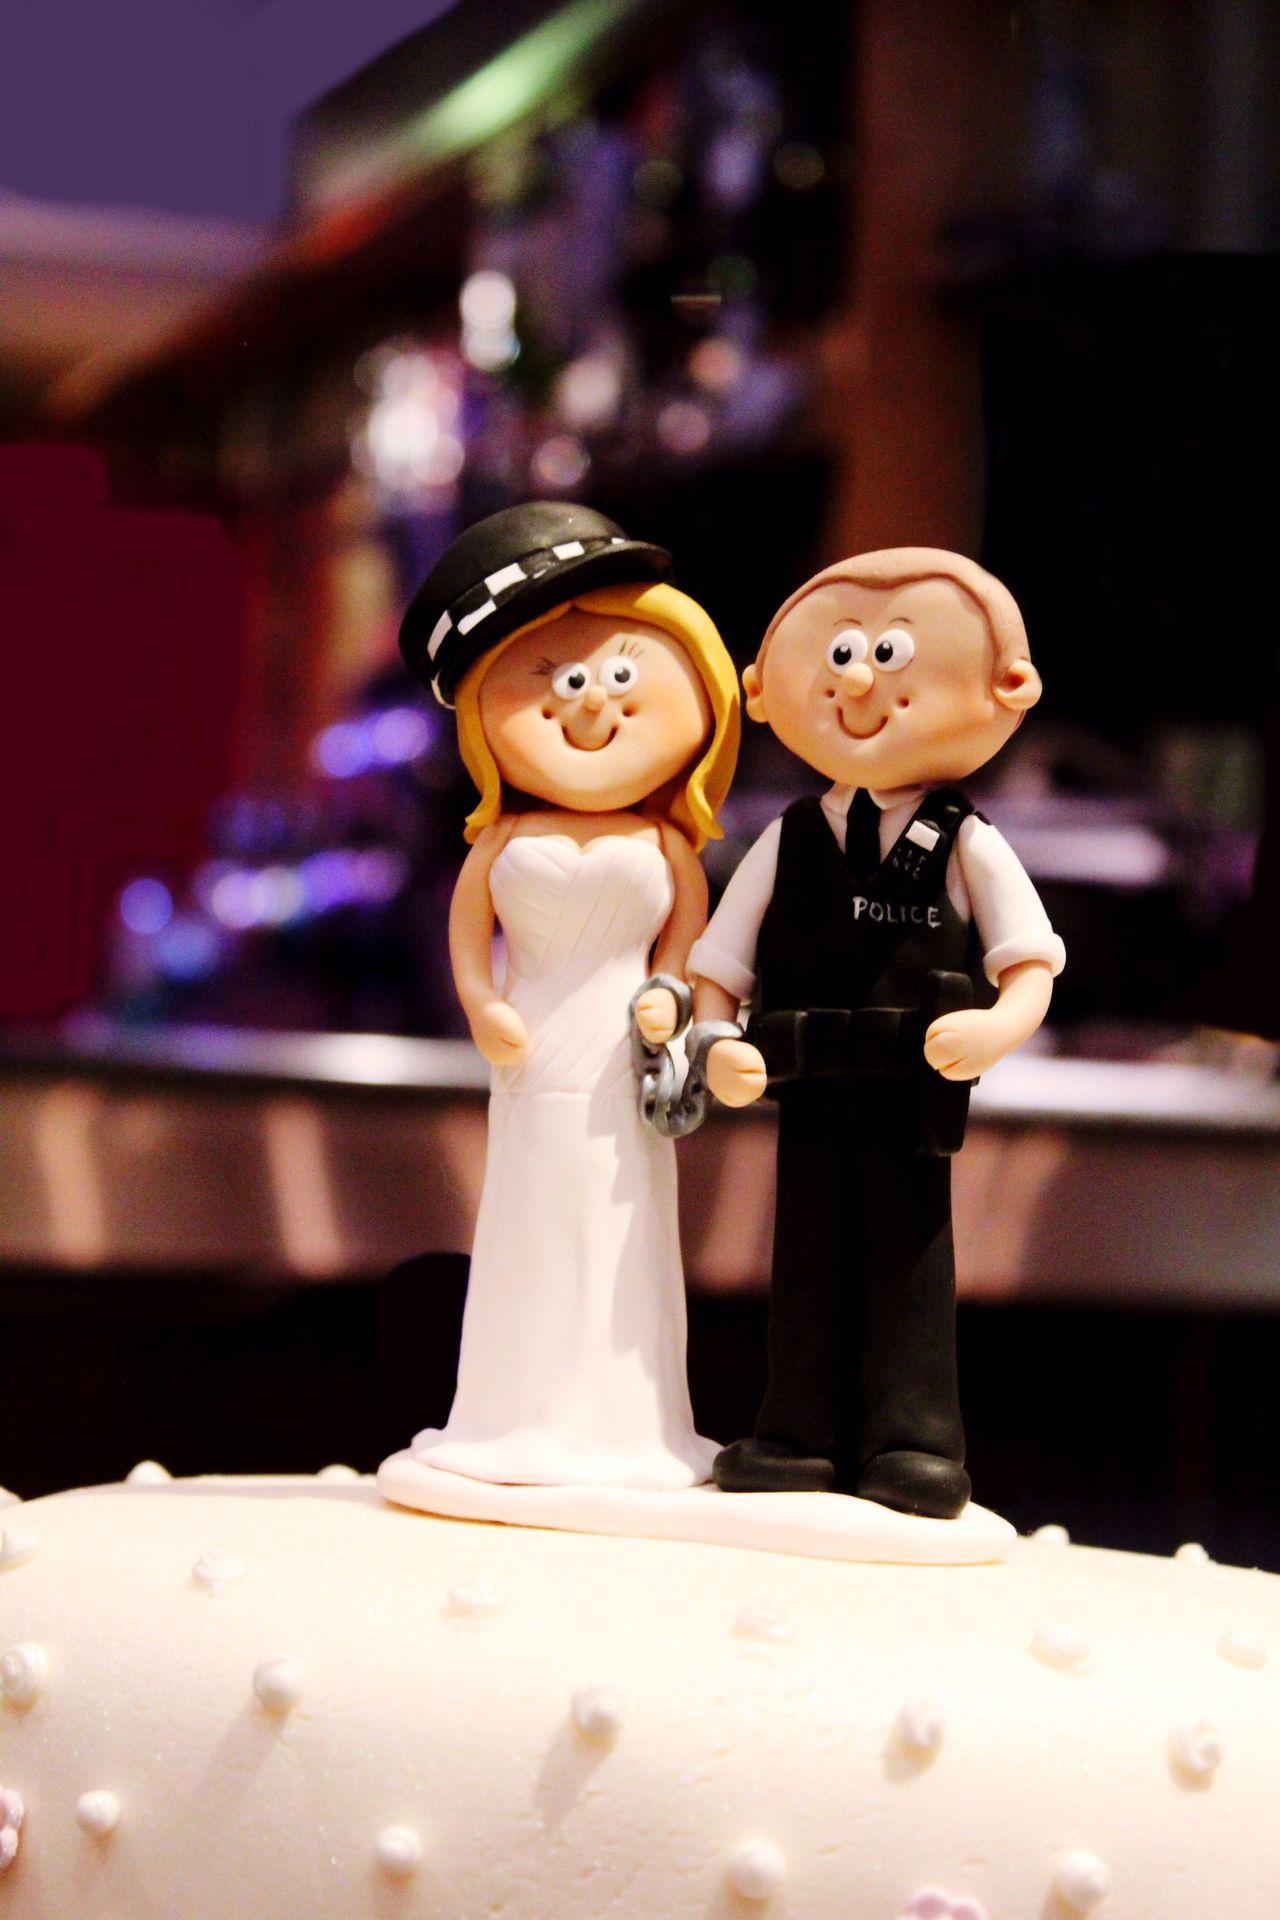 Wedding cake scene Wedding Human Representation Indoors  Figurine  Wedding Cake No People Close-up